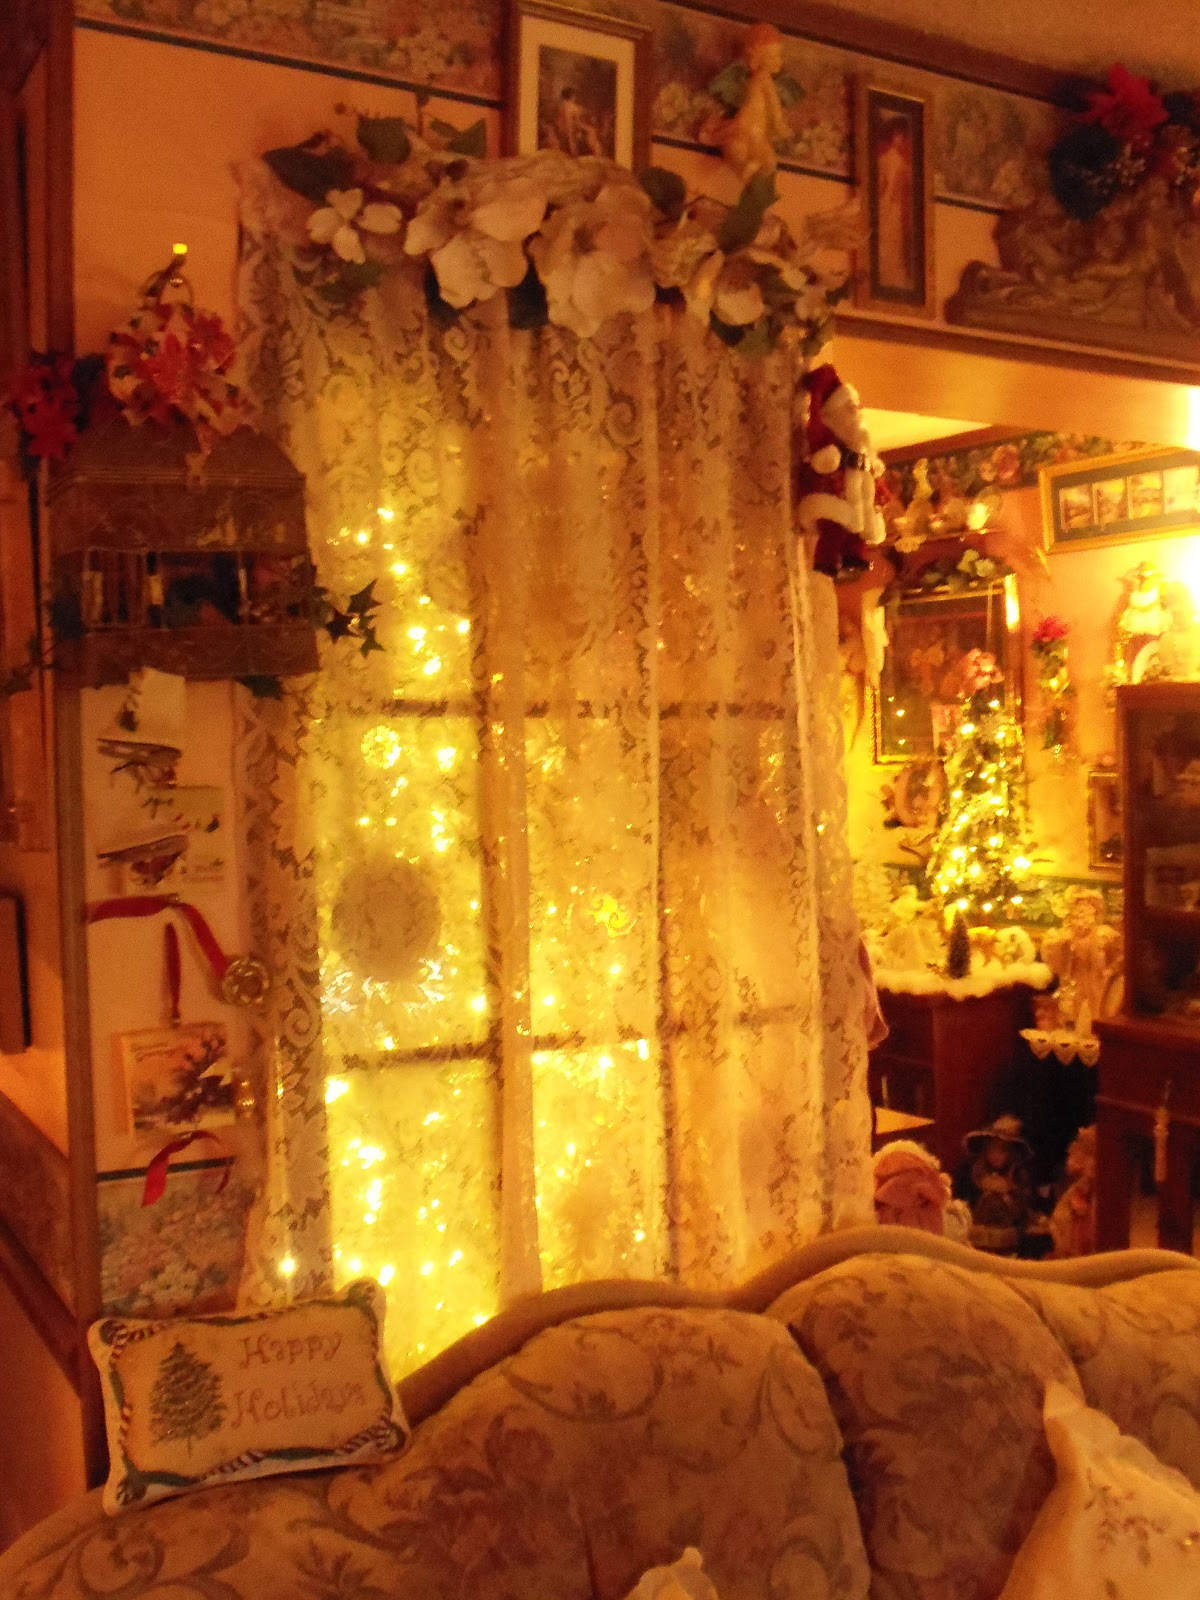 A Debbie Dabble Christmas Christmas Home Tour 2012 Part